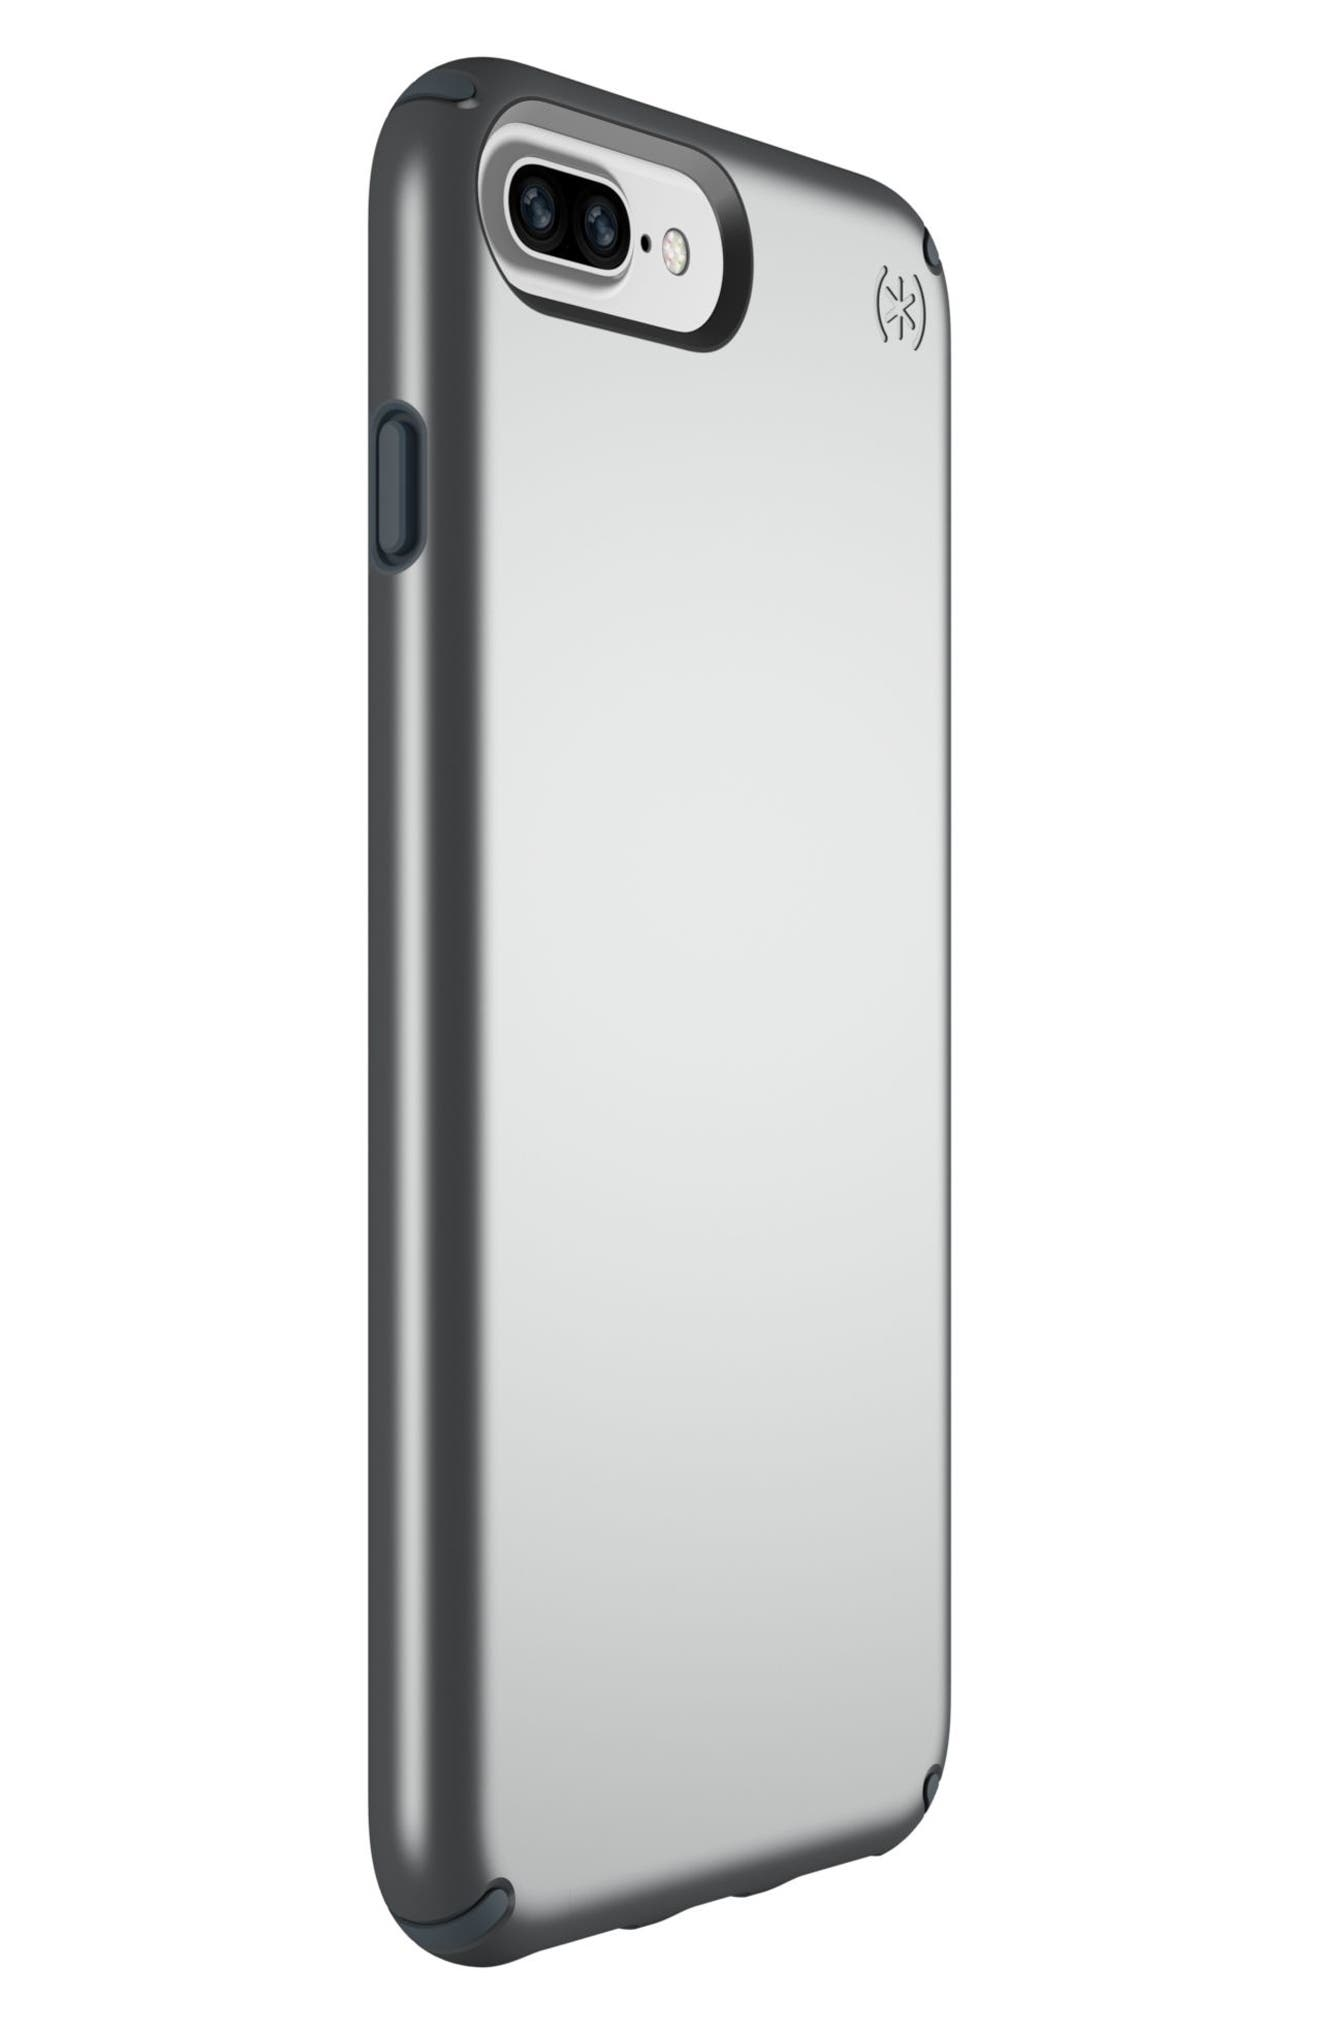 iPhone 6/6s/7/8 Case,                             Alternate thumbnail 2, color,                             Tungsten Grey Metallic/ Grey